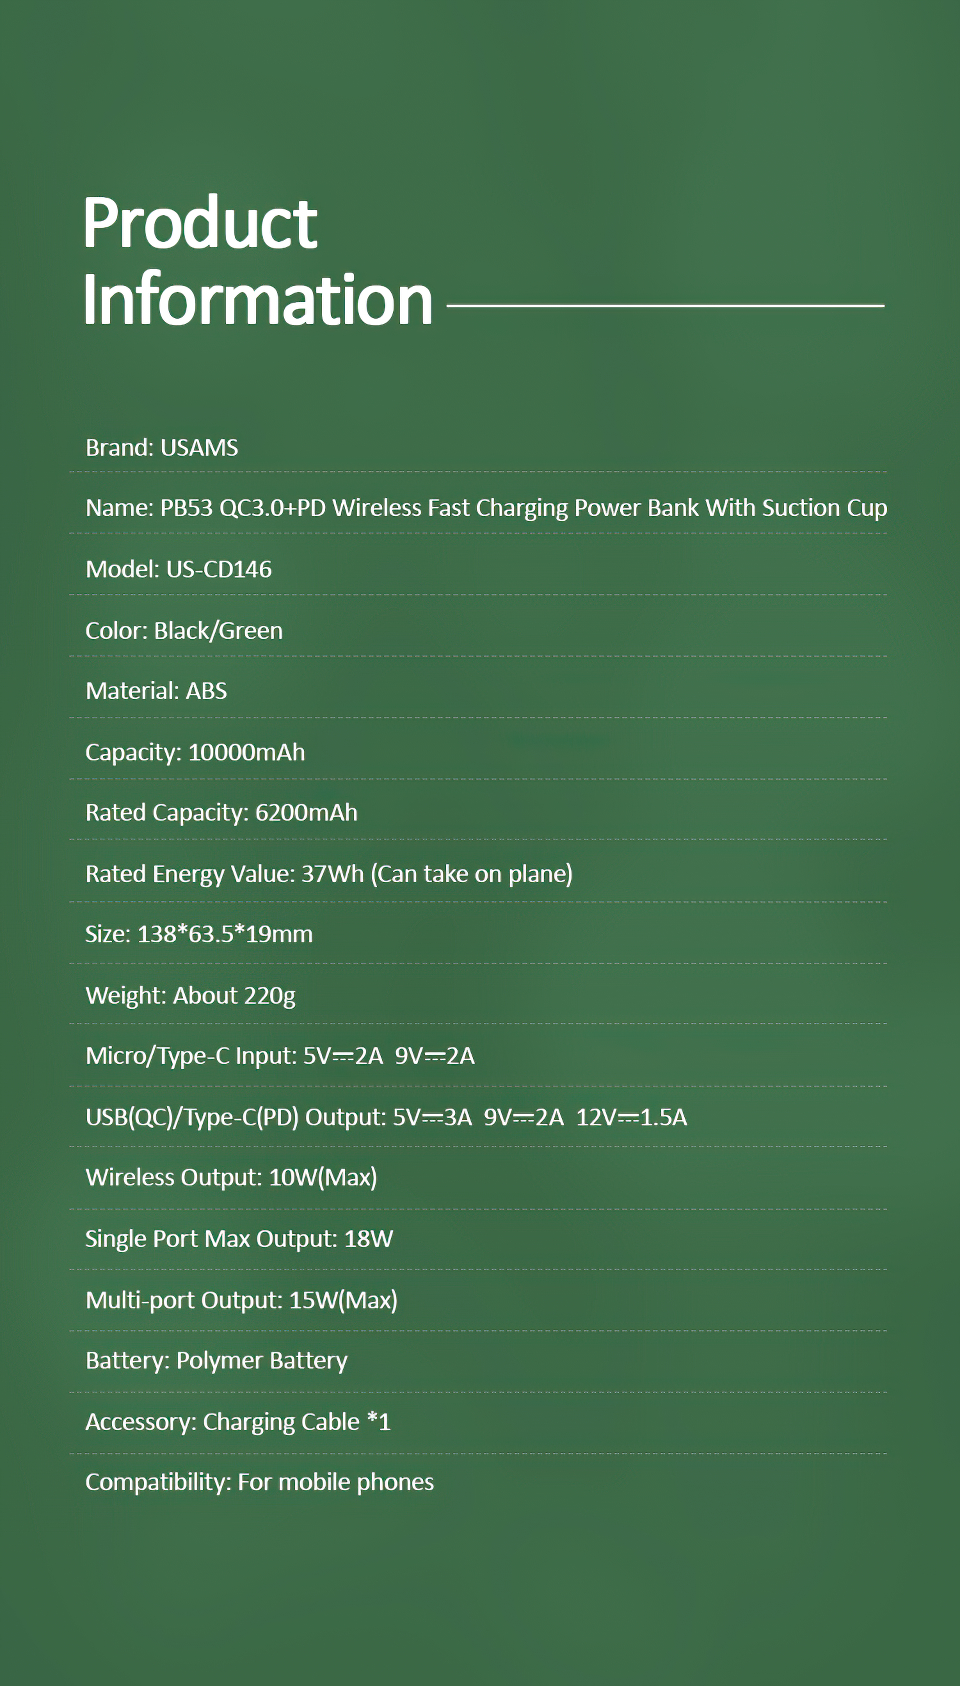 20200717-US-CD146-PB53-QC3.0+PD快充吸盘无线充移动电源-10000mAh_16-width-960px